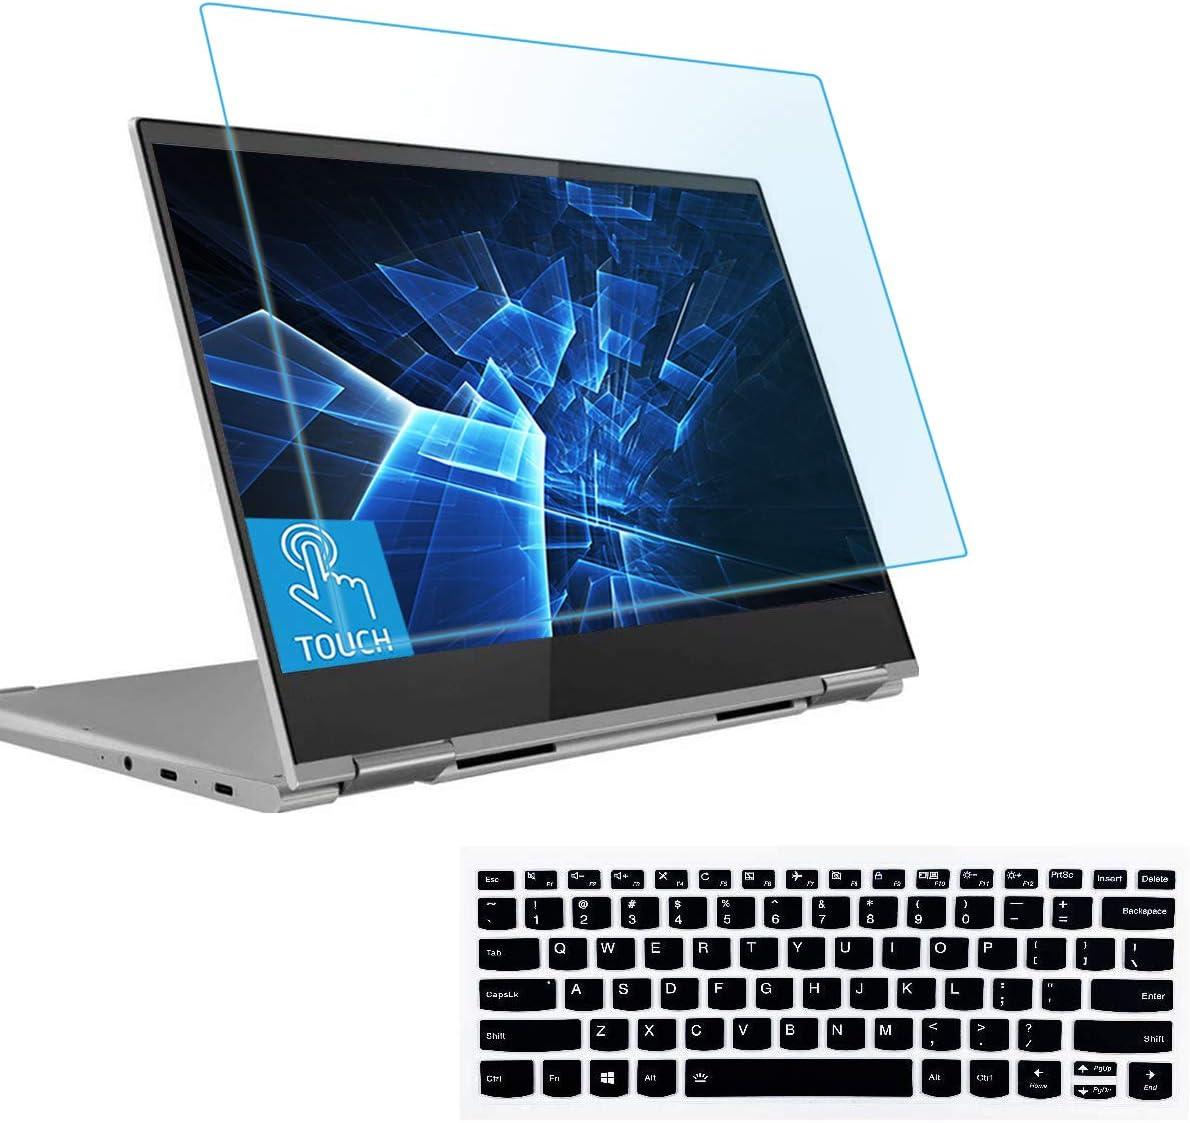 Anti Blue Light Glare Screen Manufacturer OFFicial shop Denver Mall Lenovo Yog for Protector 13.9